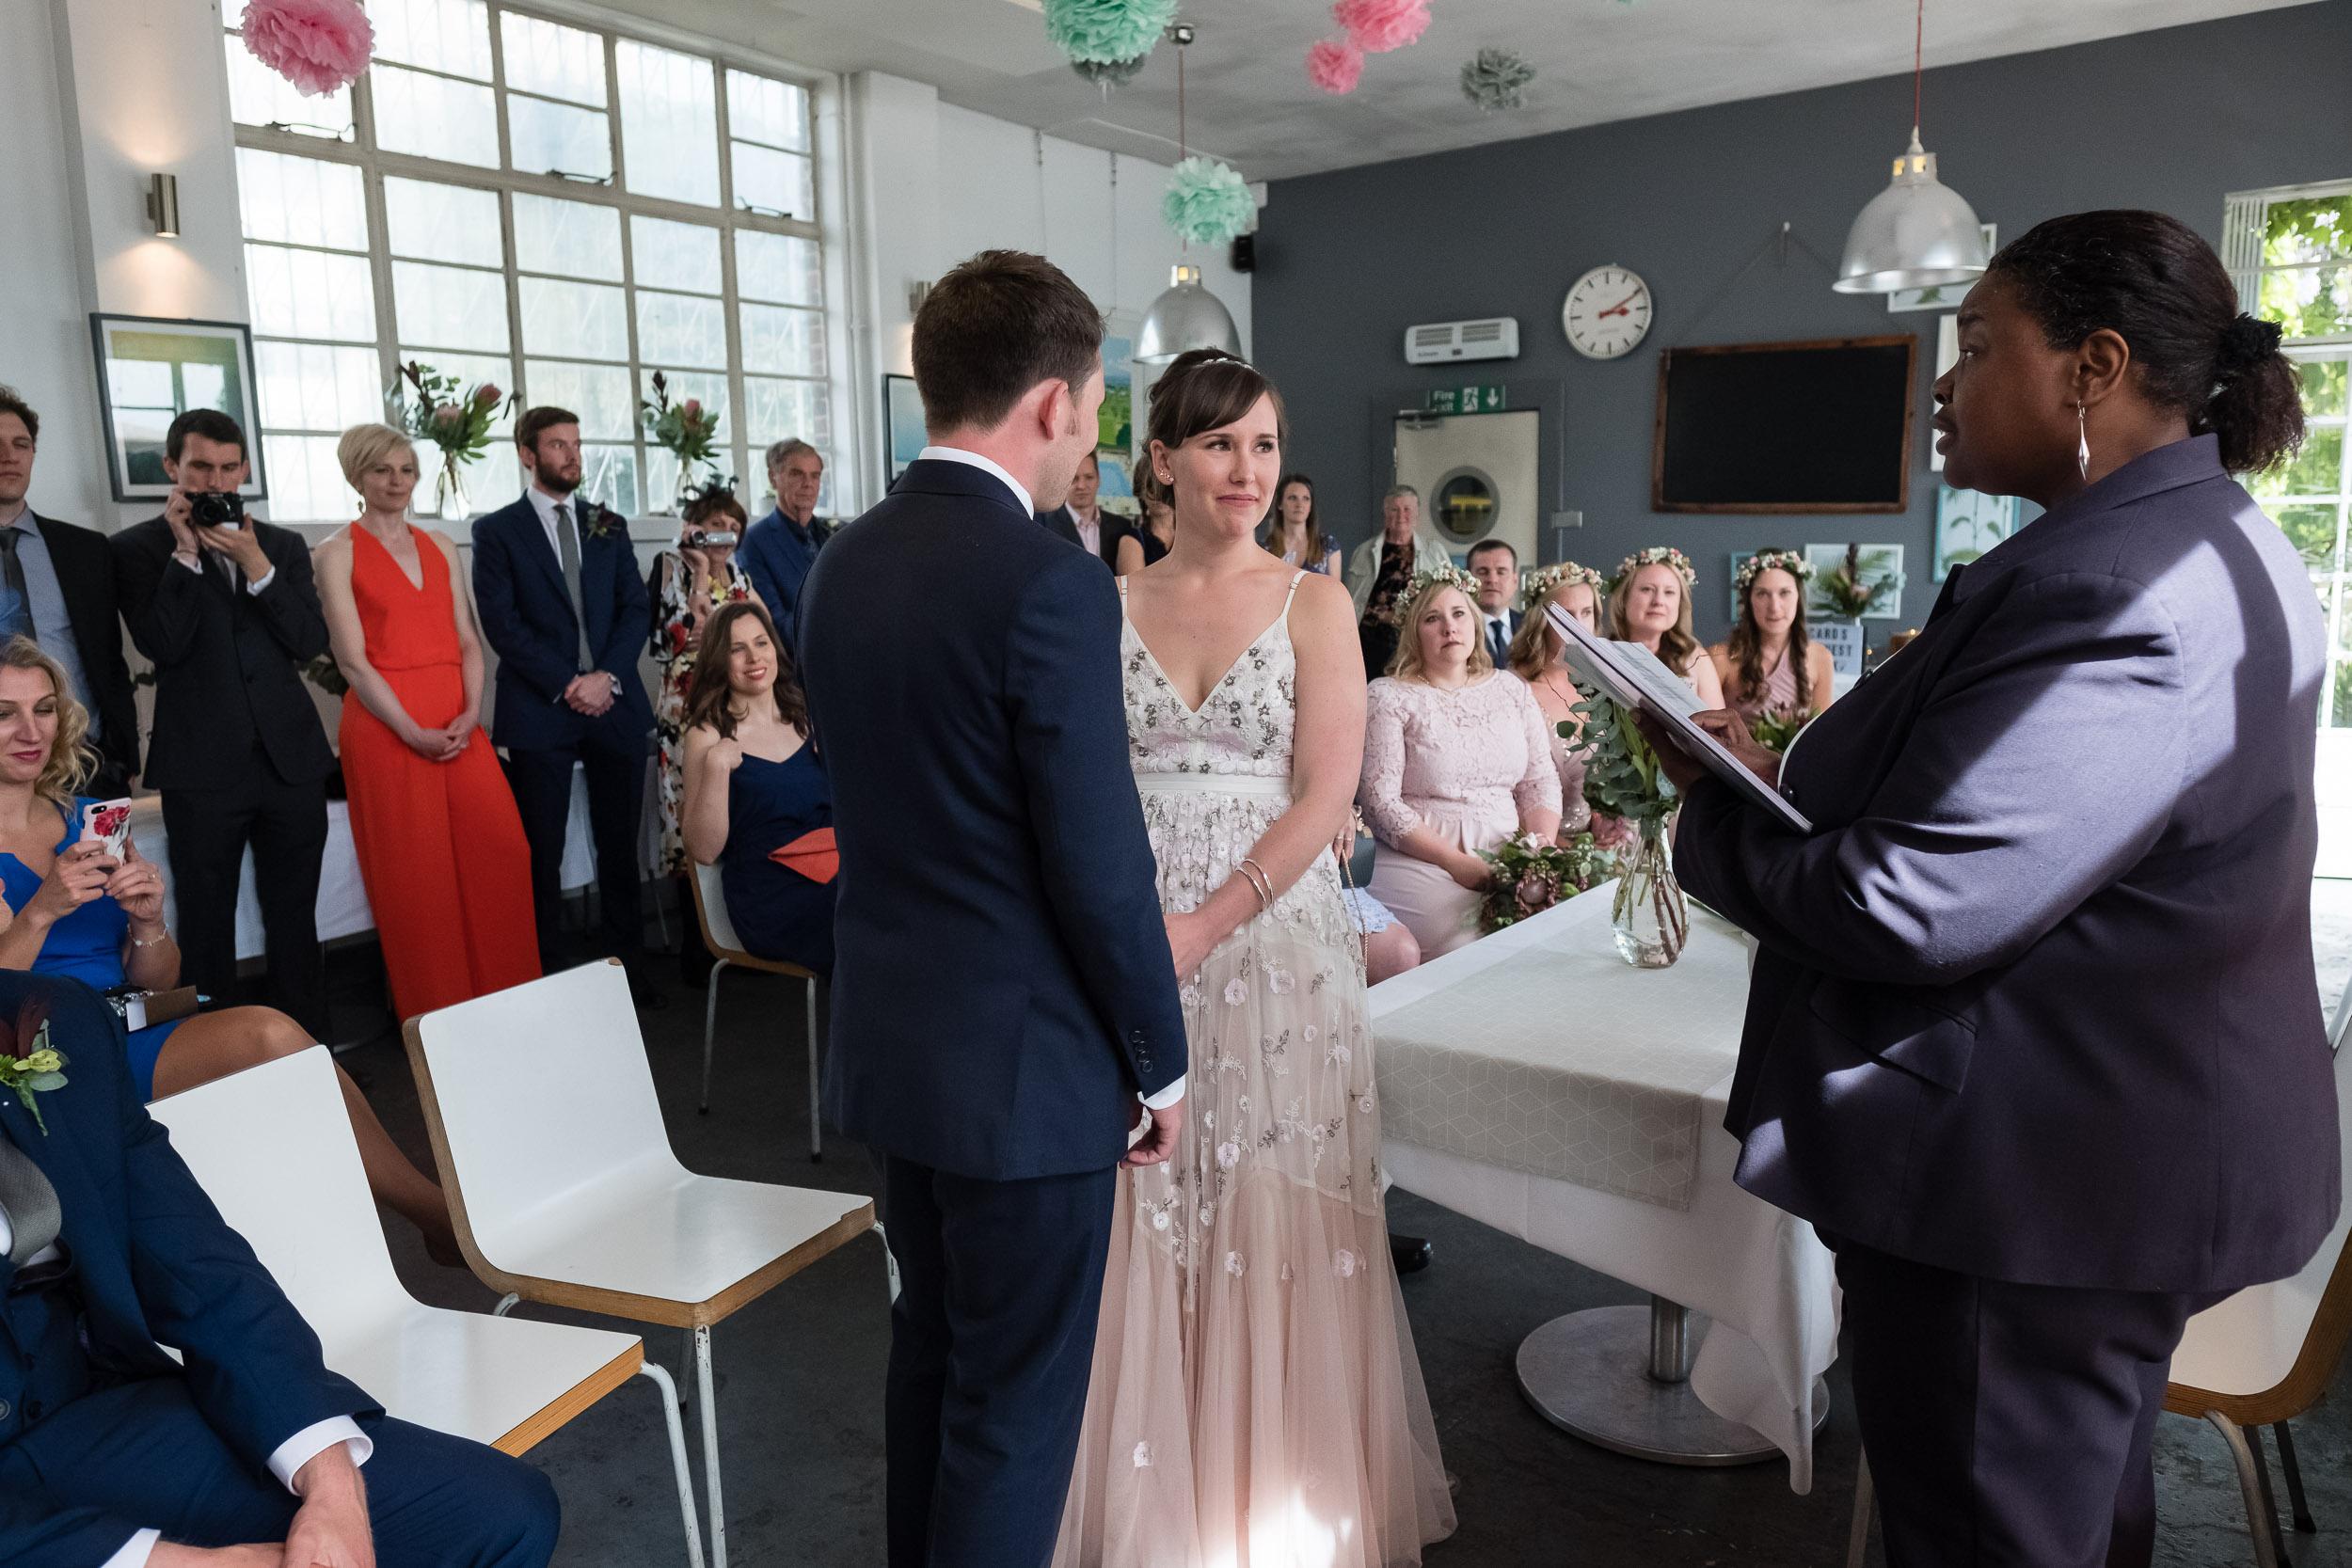 brockwell-lido-brixton-herne-hill-wedding-138.jpg